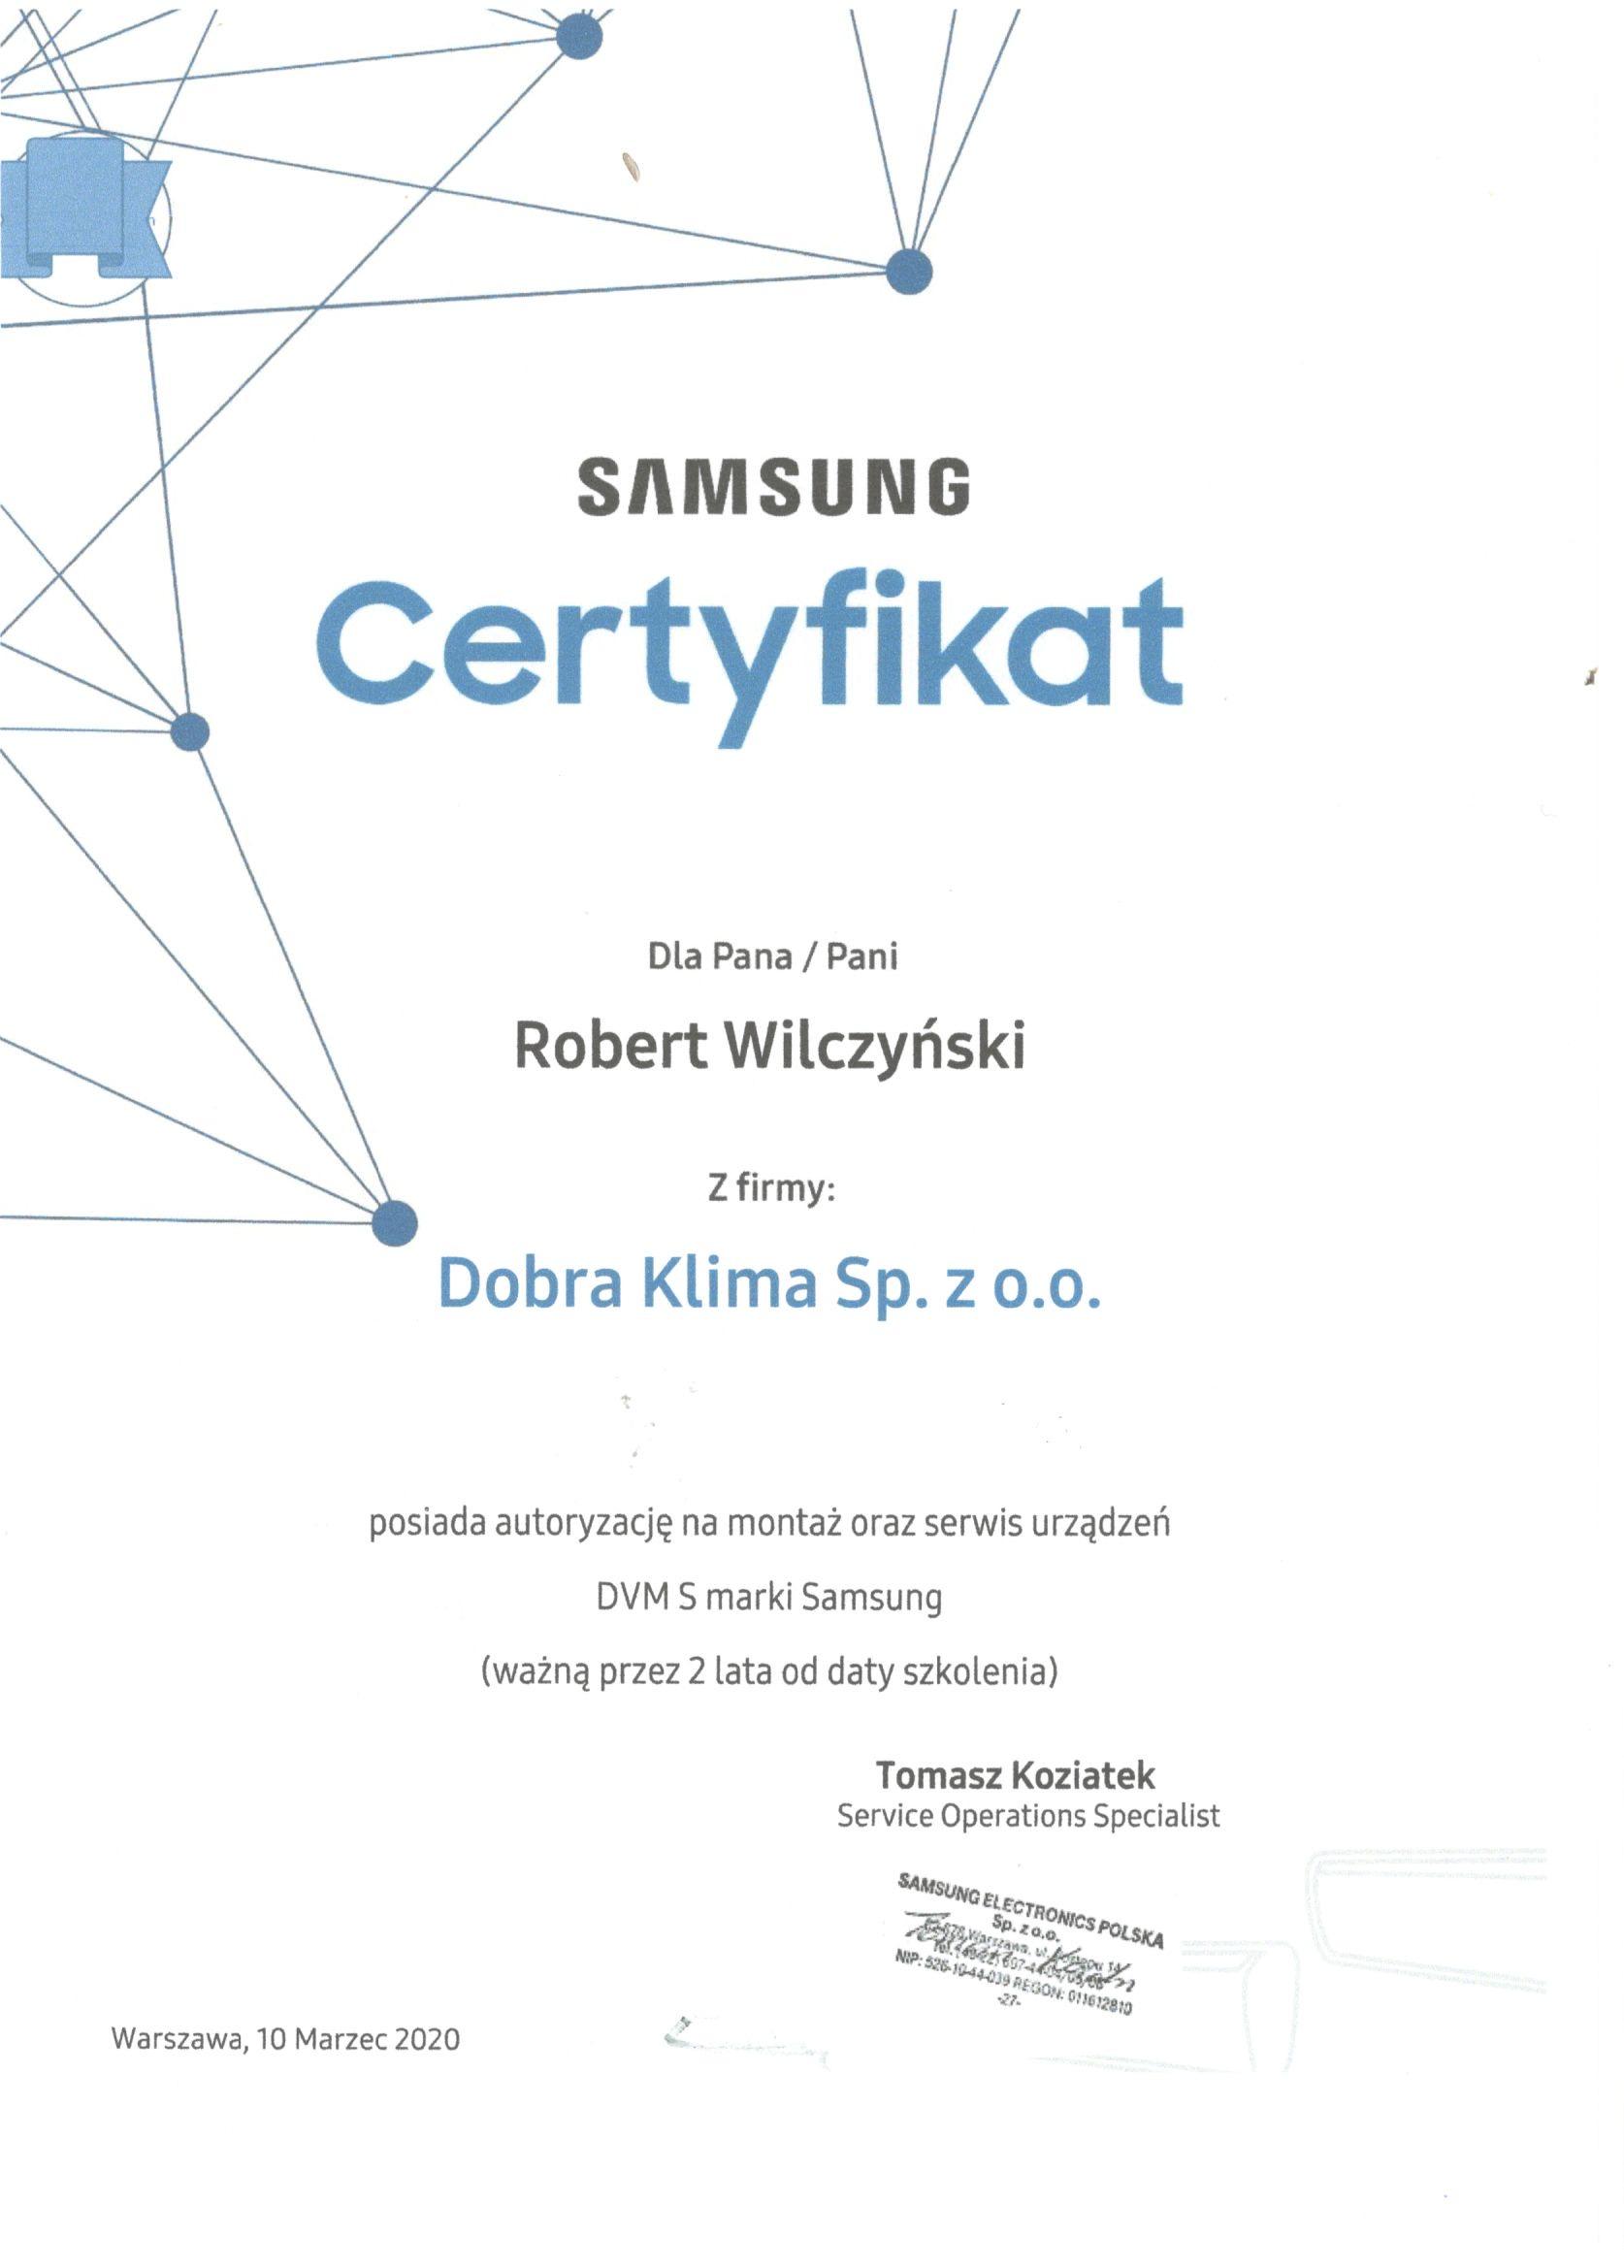 2020-certyfikat-samsung-robert-wilczynski